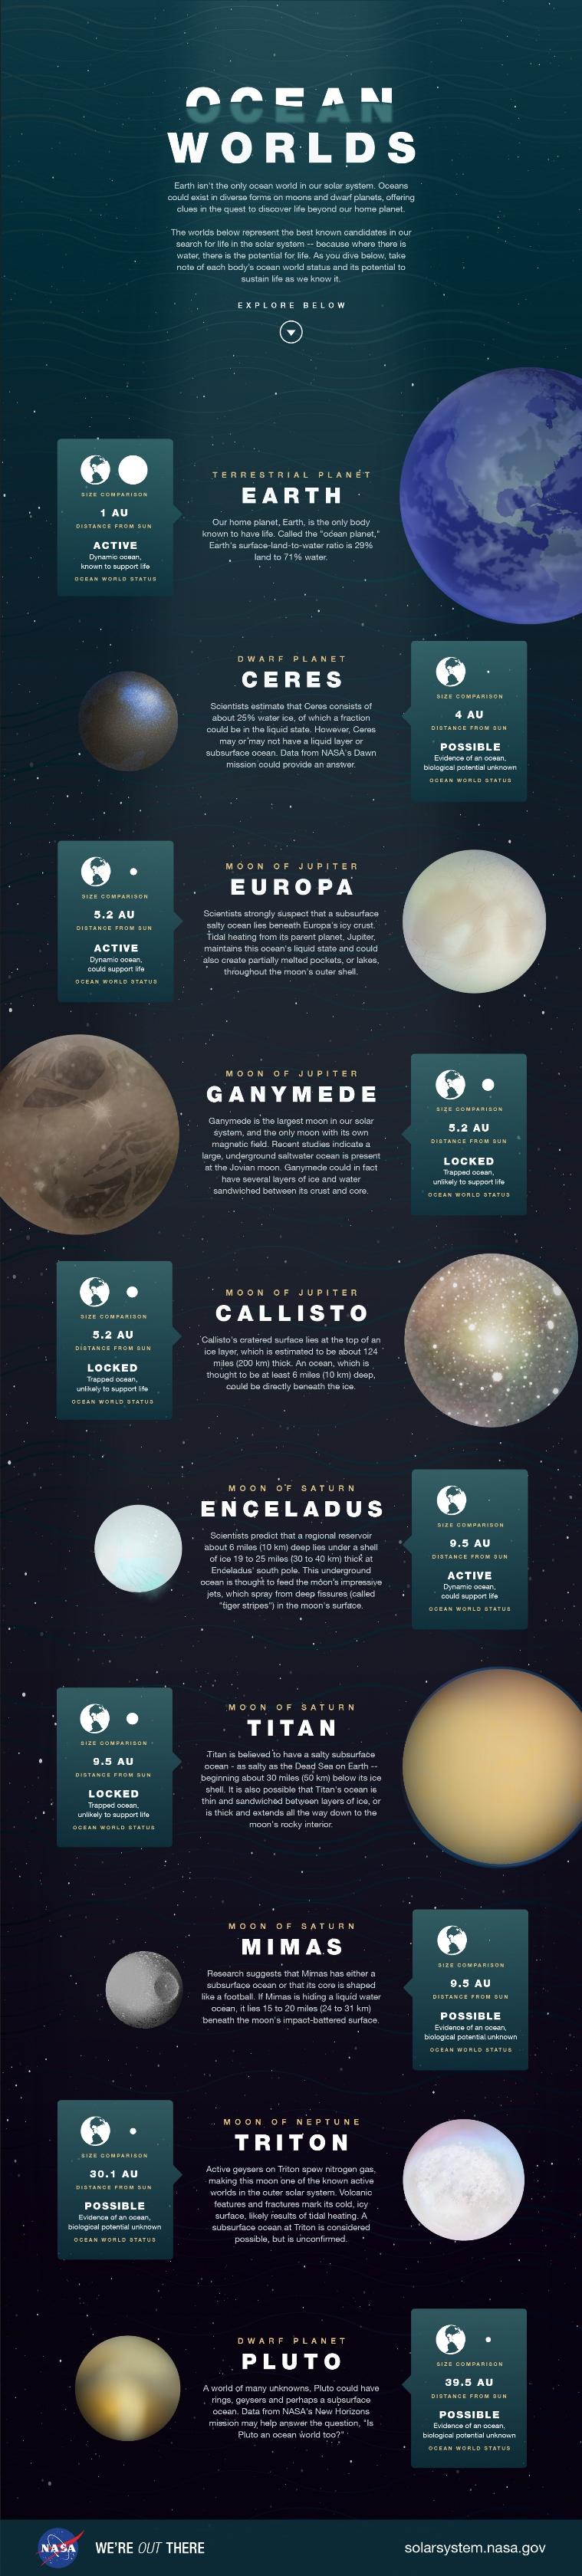 ocean worlds infographic